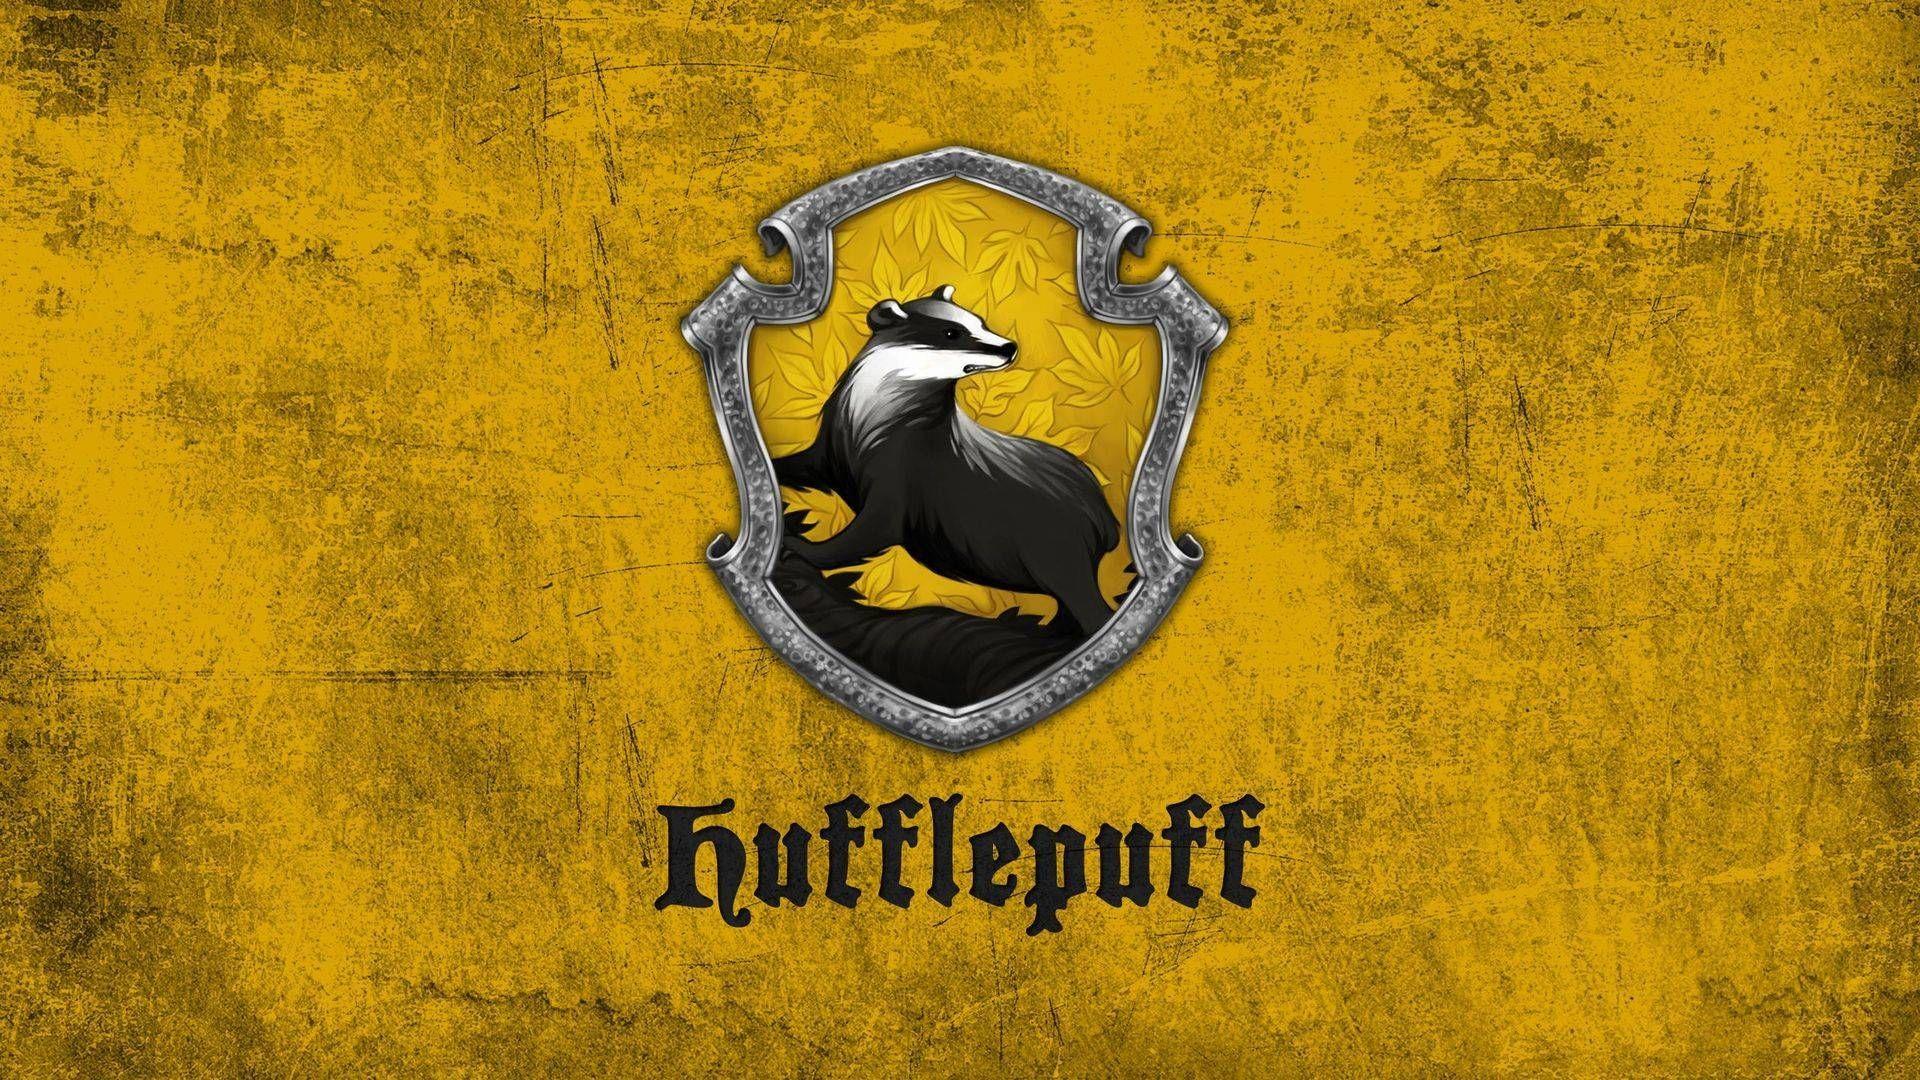 Harry Potter Hufflepuff Harry Potter Wallpaper Harry Potter